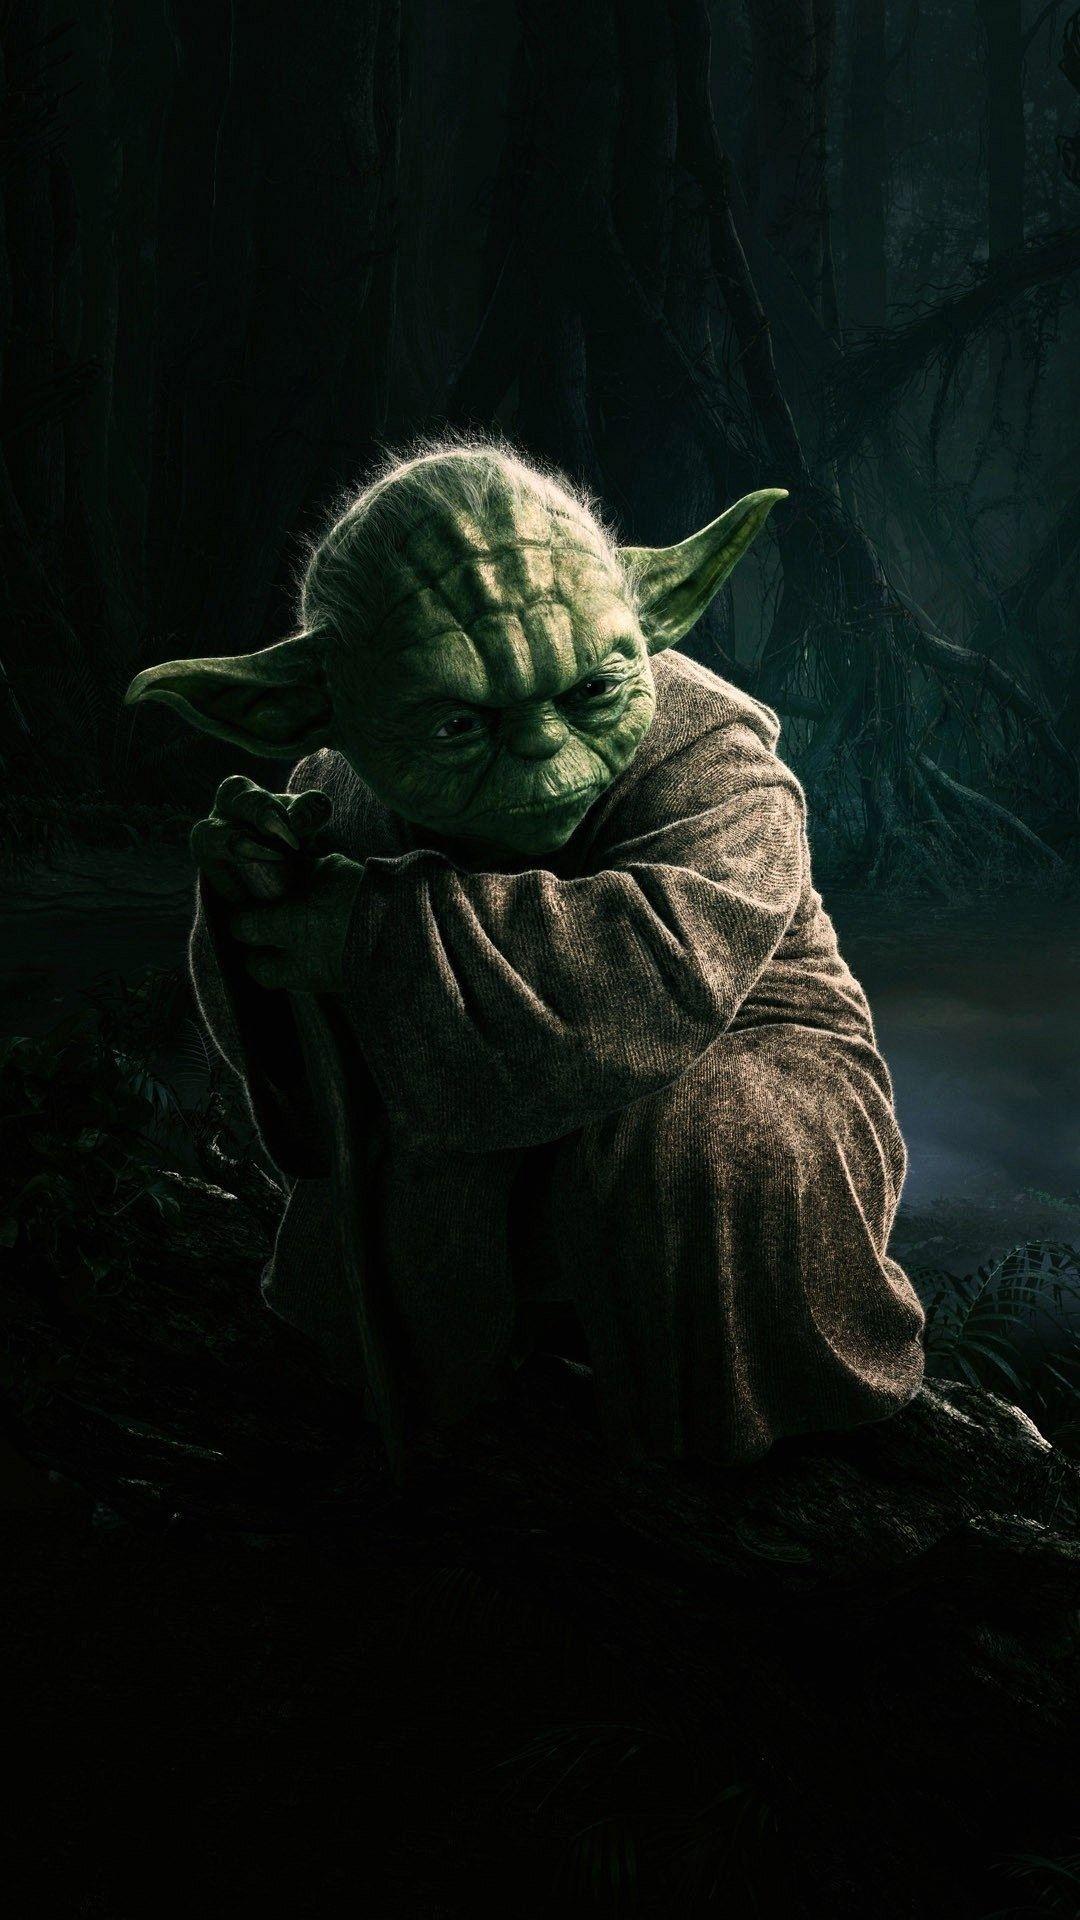 Hd Yoda Illustration Star Wars Smartphone Wallpaper And Lockscreen Hd Check More At Https Phonewallp Com Hd Yoda I Star Wars Yoda Art Star Wars Yoda Yoda Art